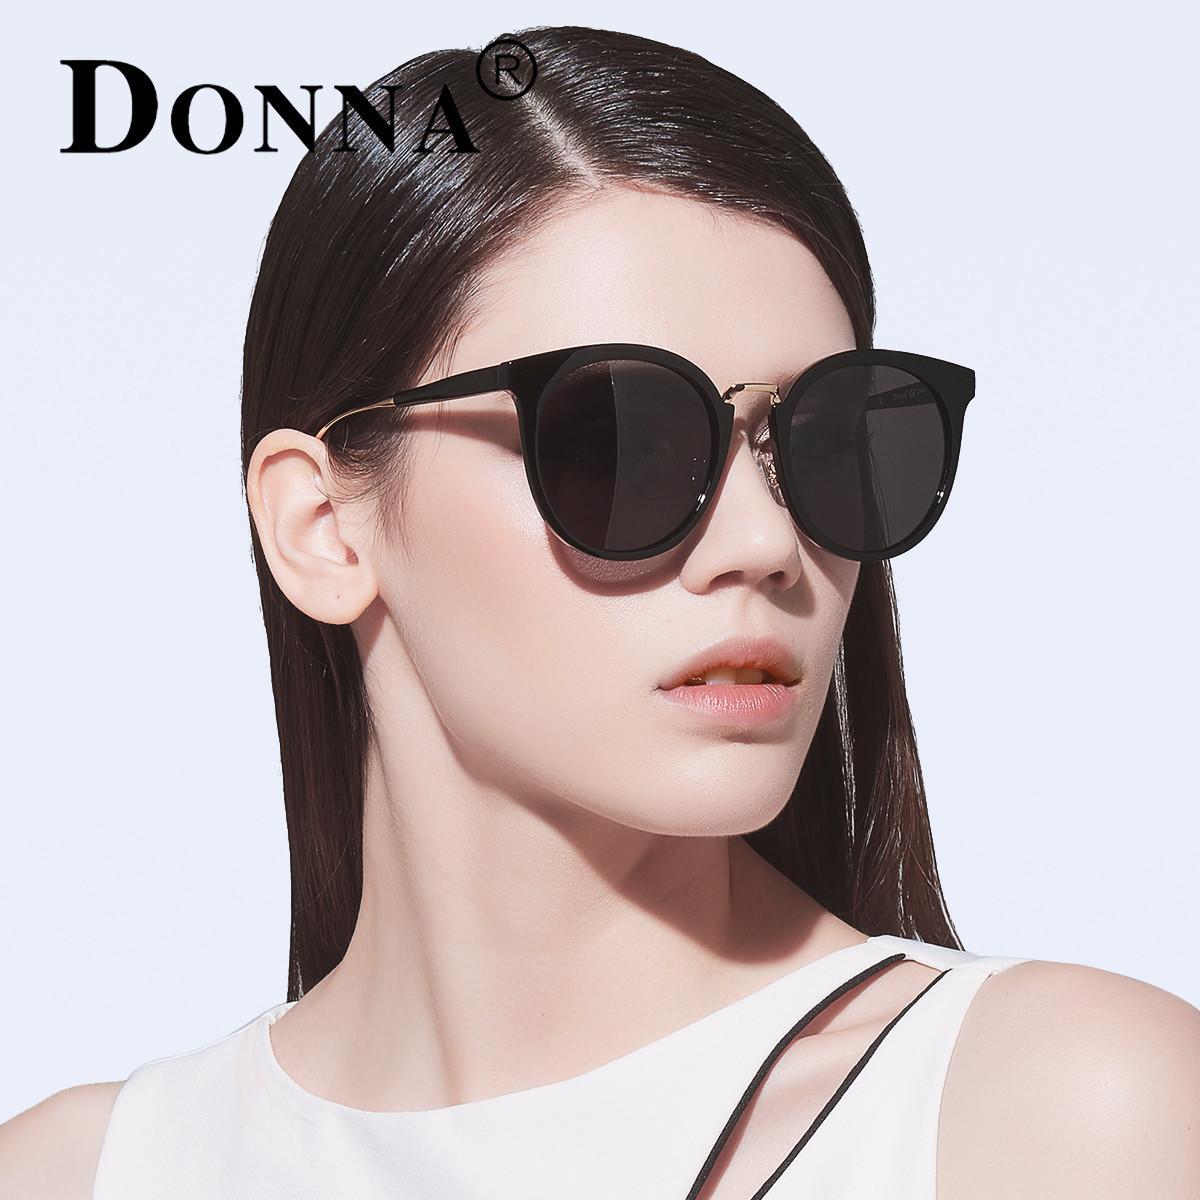 DONNA哆哪新款 经典圆框时尚墨镜 优雅圆框黑超偏光太阳镜 D86